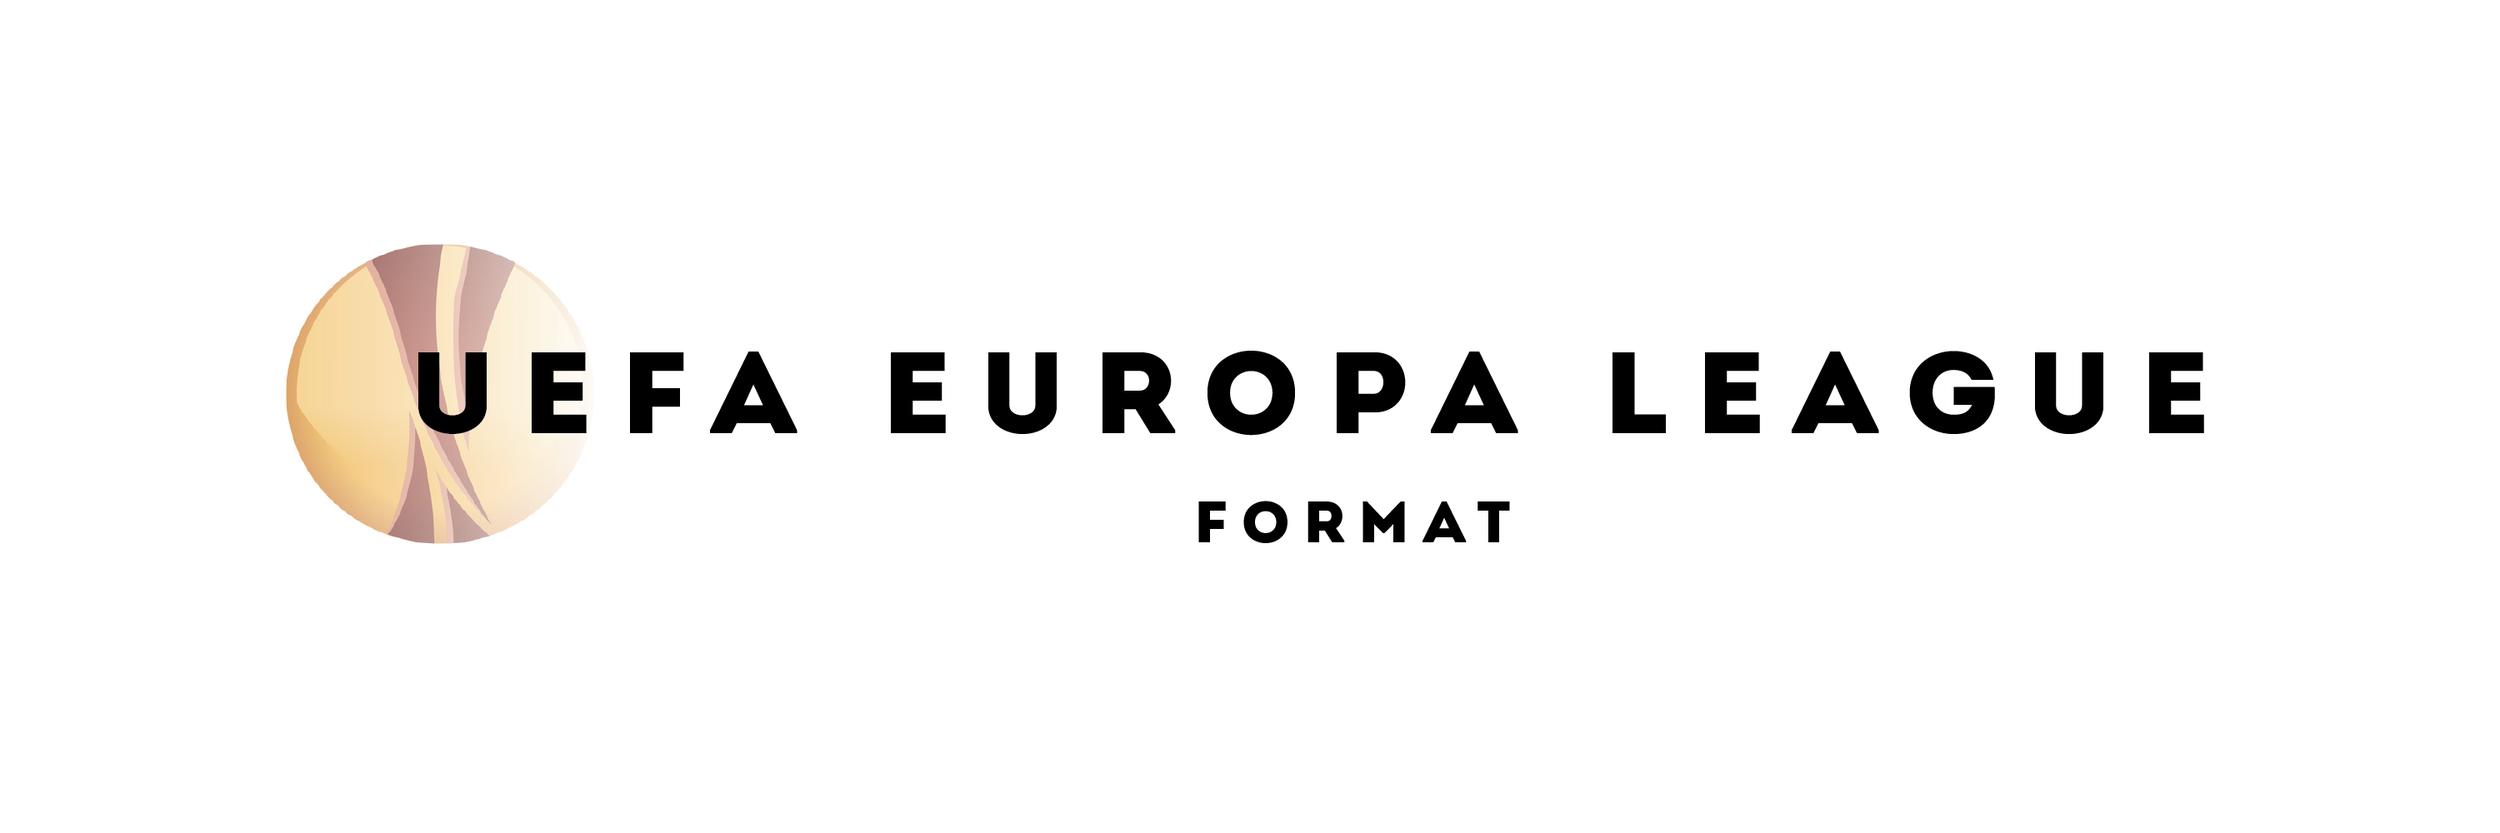 uefa europa league format agonasport com uefa europa league format agonasport com